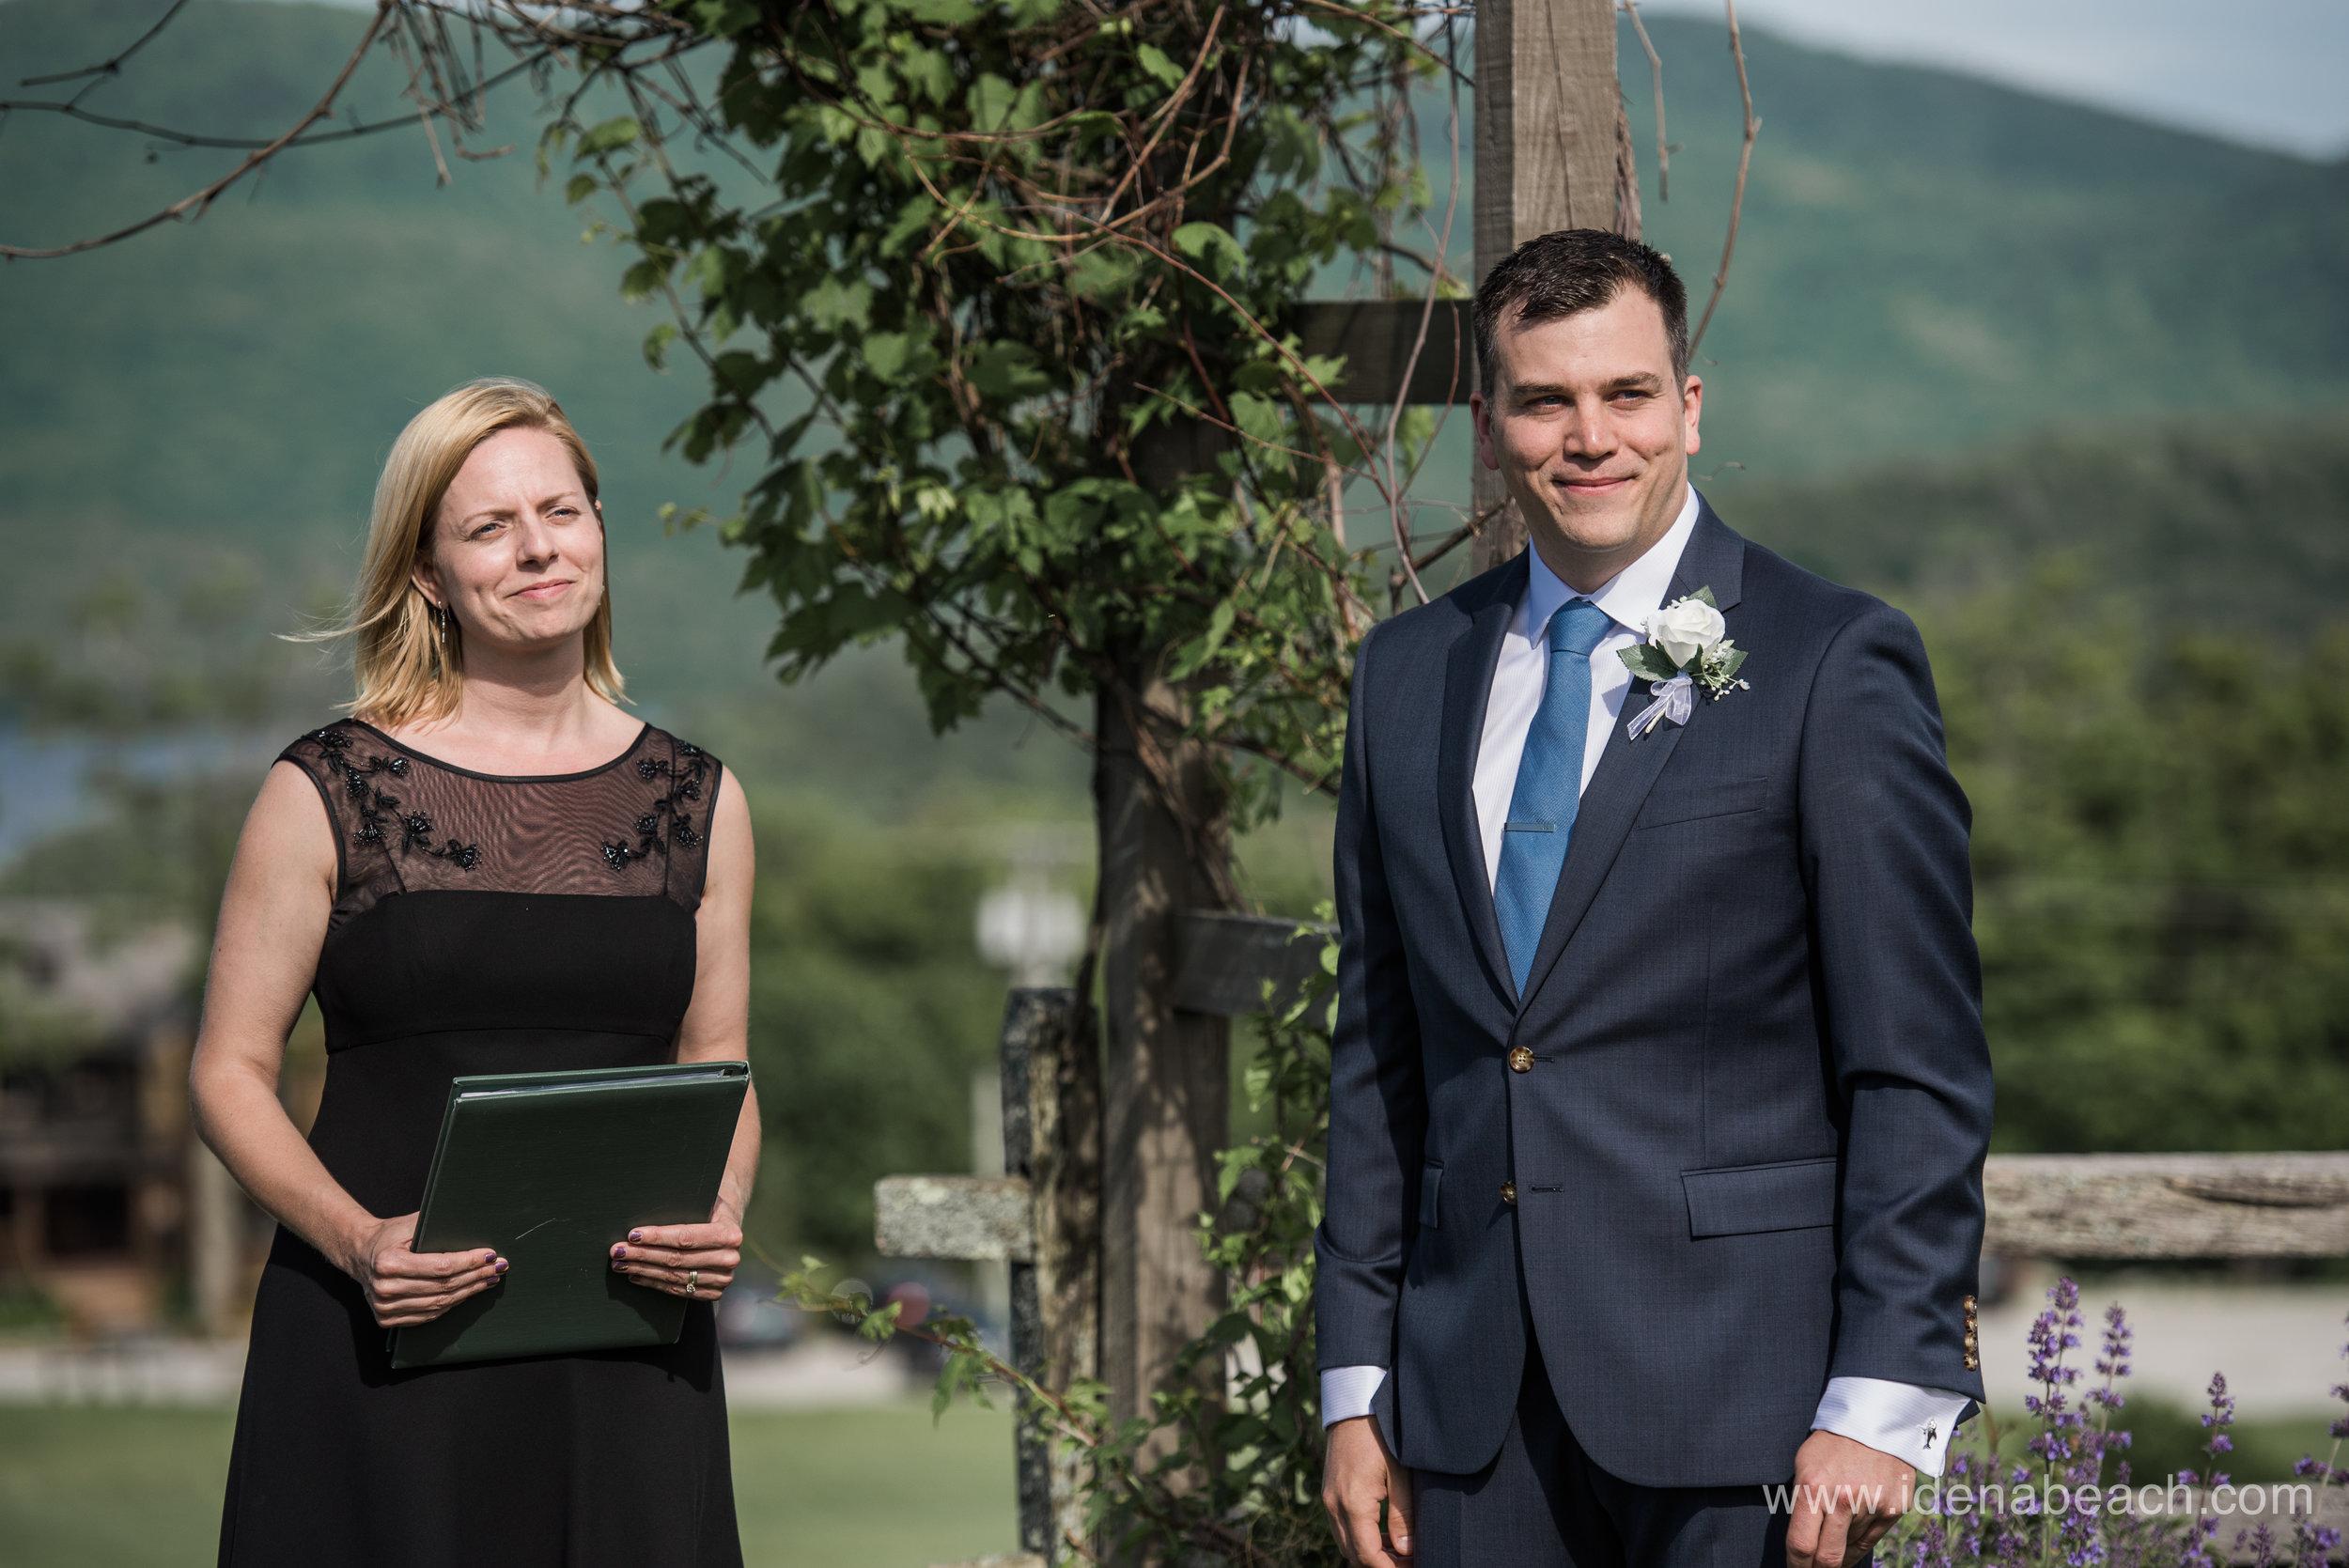 Mountain-Top-Inn-Vermont-Wedding-Photographer-36.jpg